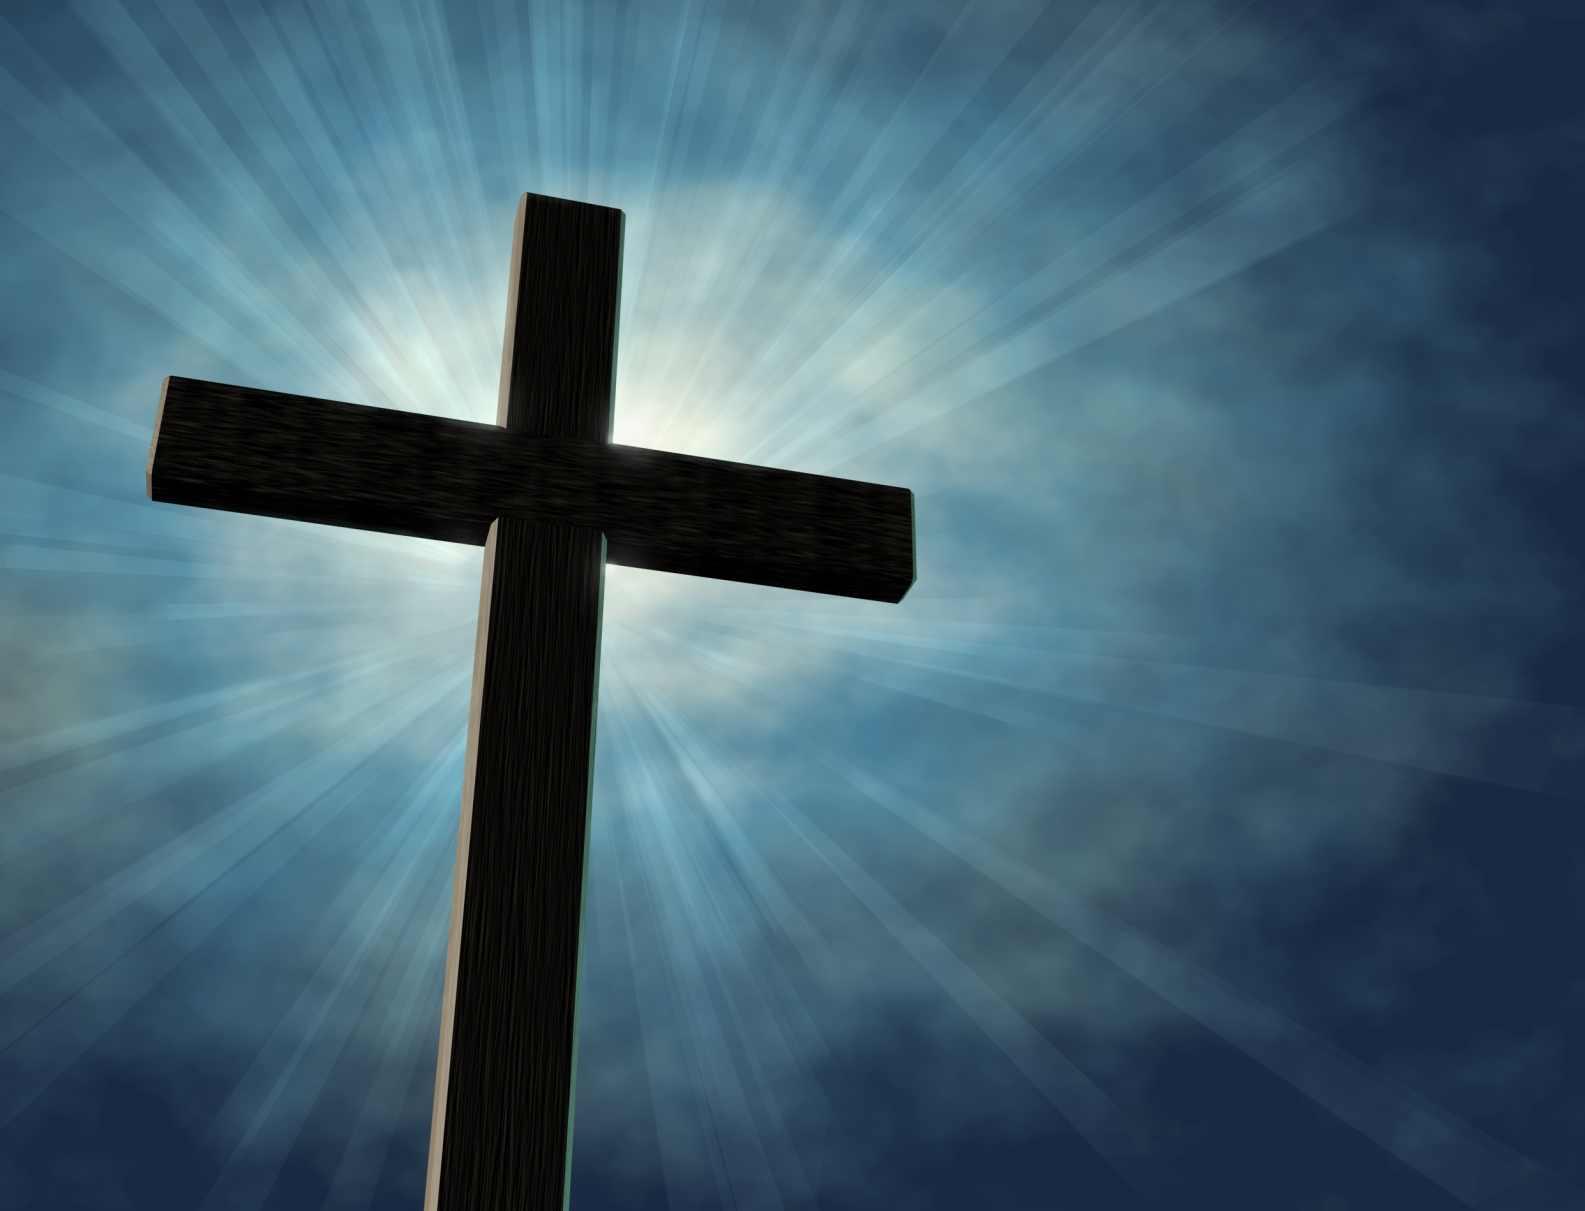 A Pilgrim U0026 39 S Progress  The Cross Covers Church Life